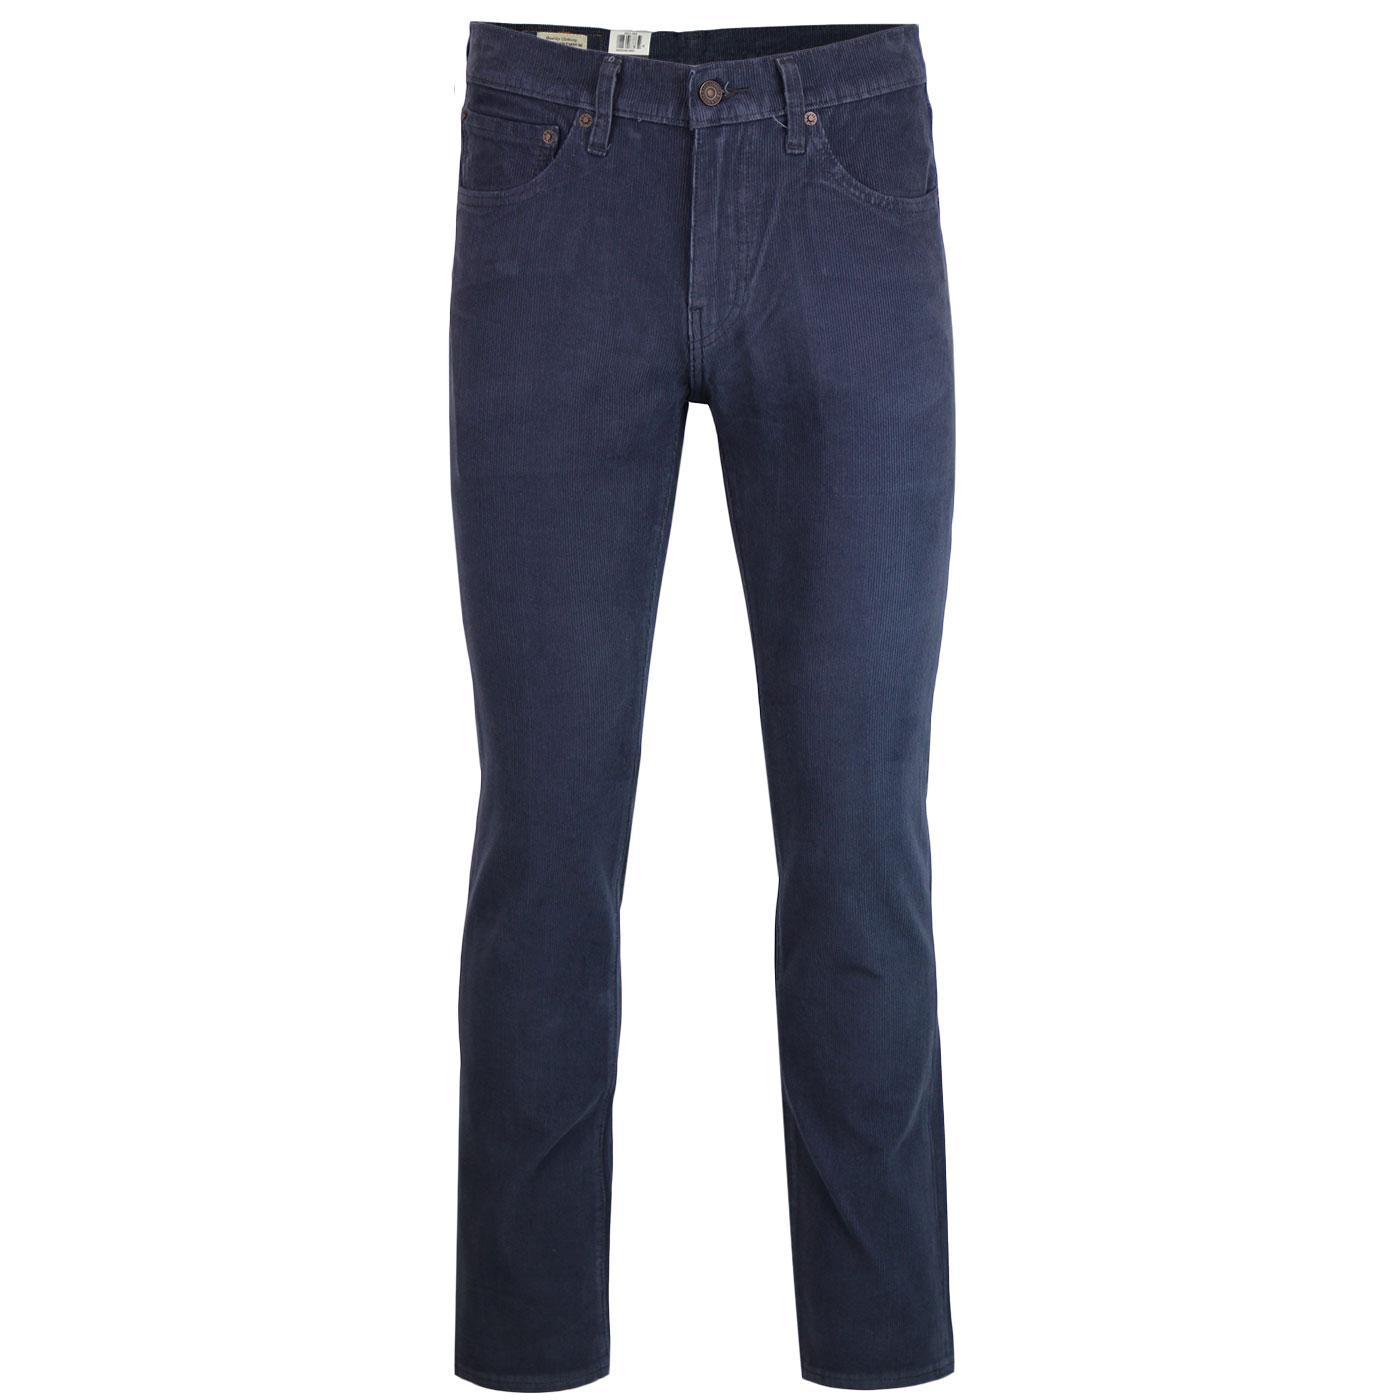 LEVI'S 511 Retro Mod Slim Cord Jeans (Ombre Blue)